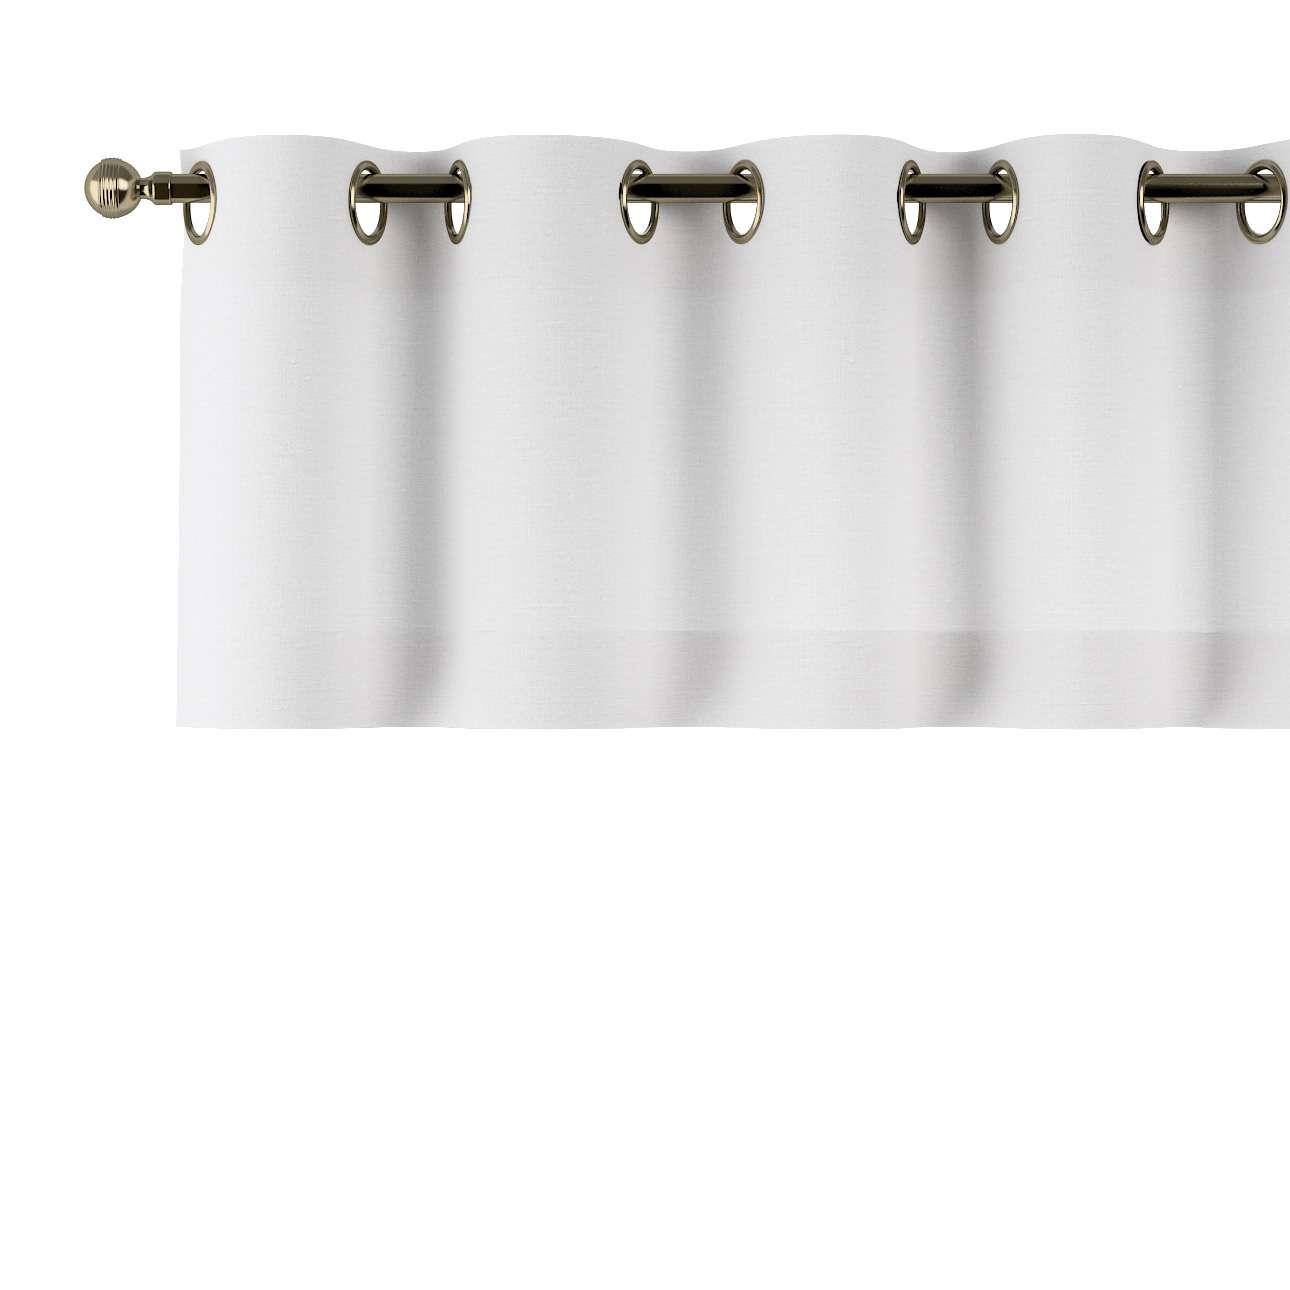 Lambrekin na kółkach 130x40cm w kolekcji Linen, tkanina: 392-04